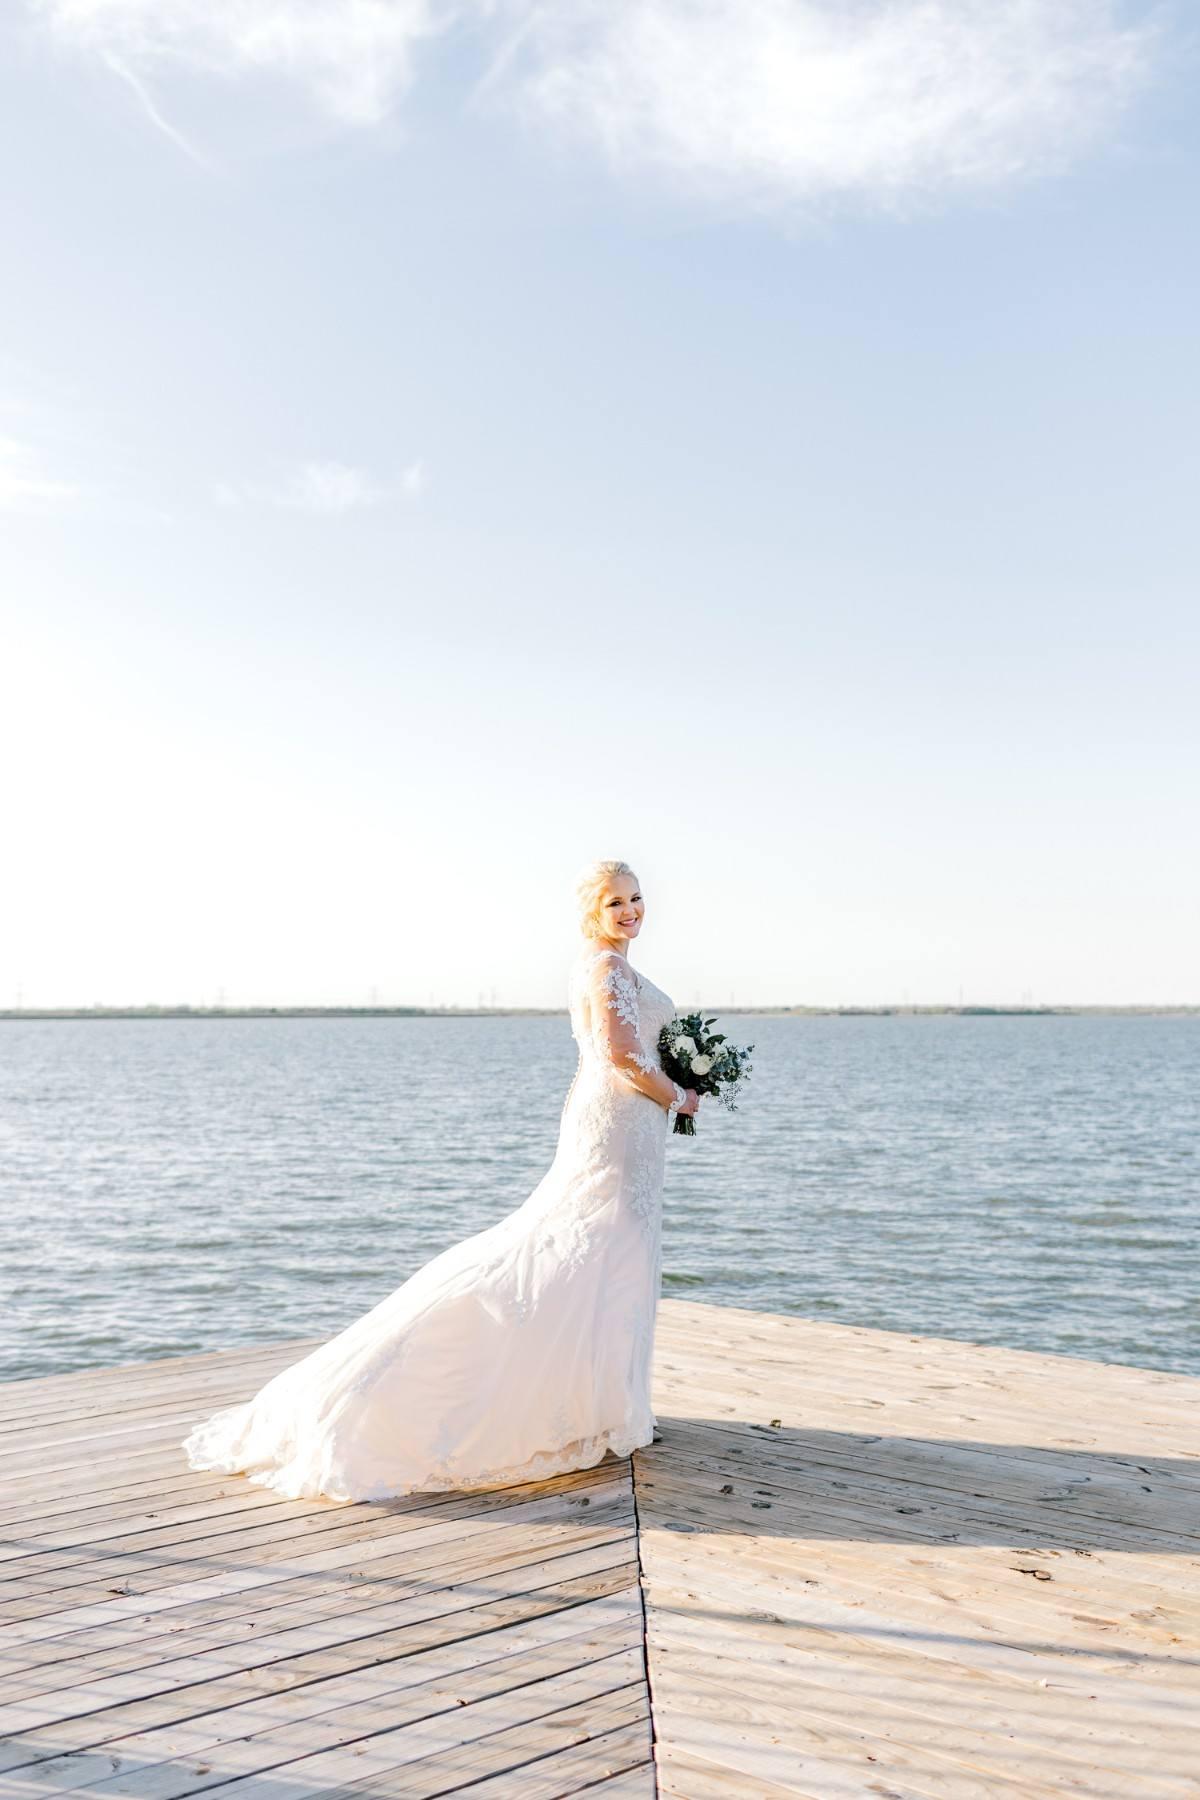 casidy-bridals-tradinghouse-lake-waco-wedding-photographer-kaitlyn-bullard-16.jpg